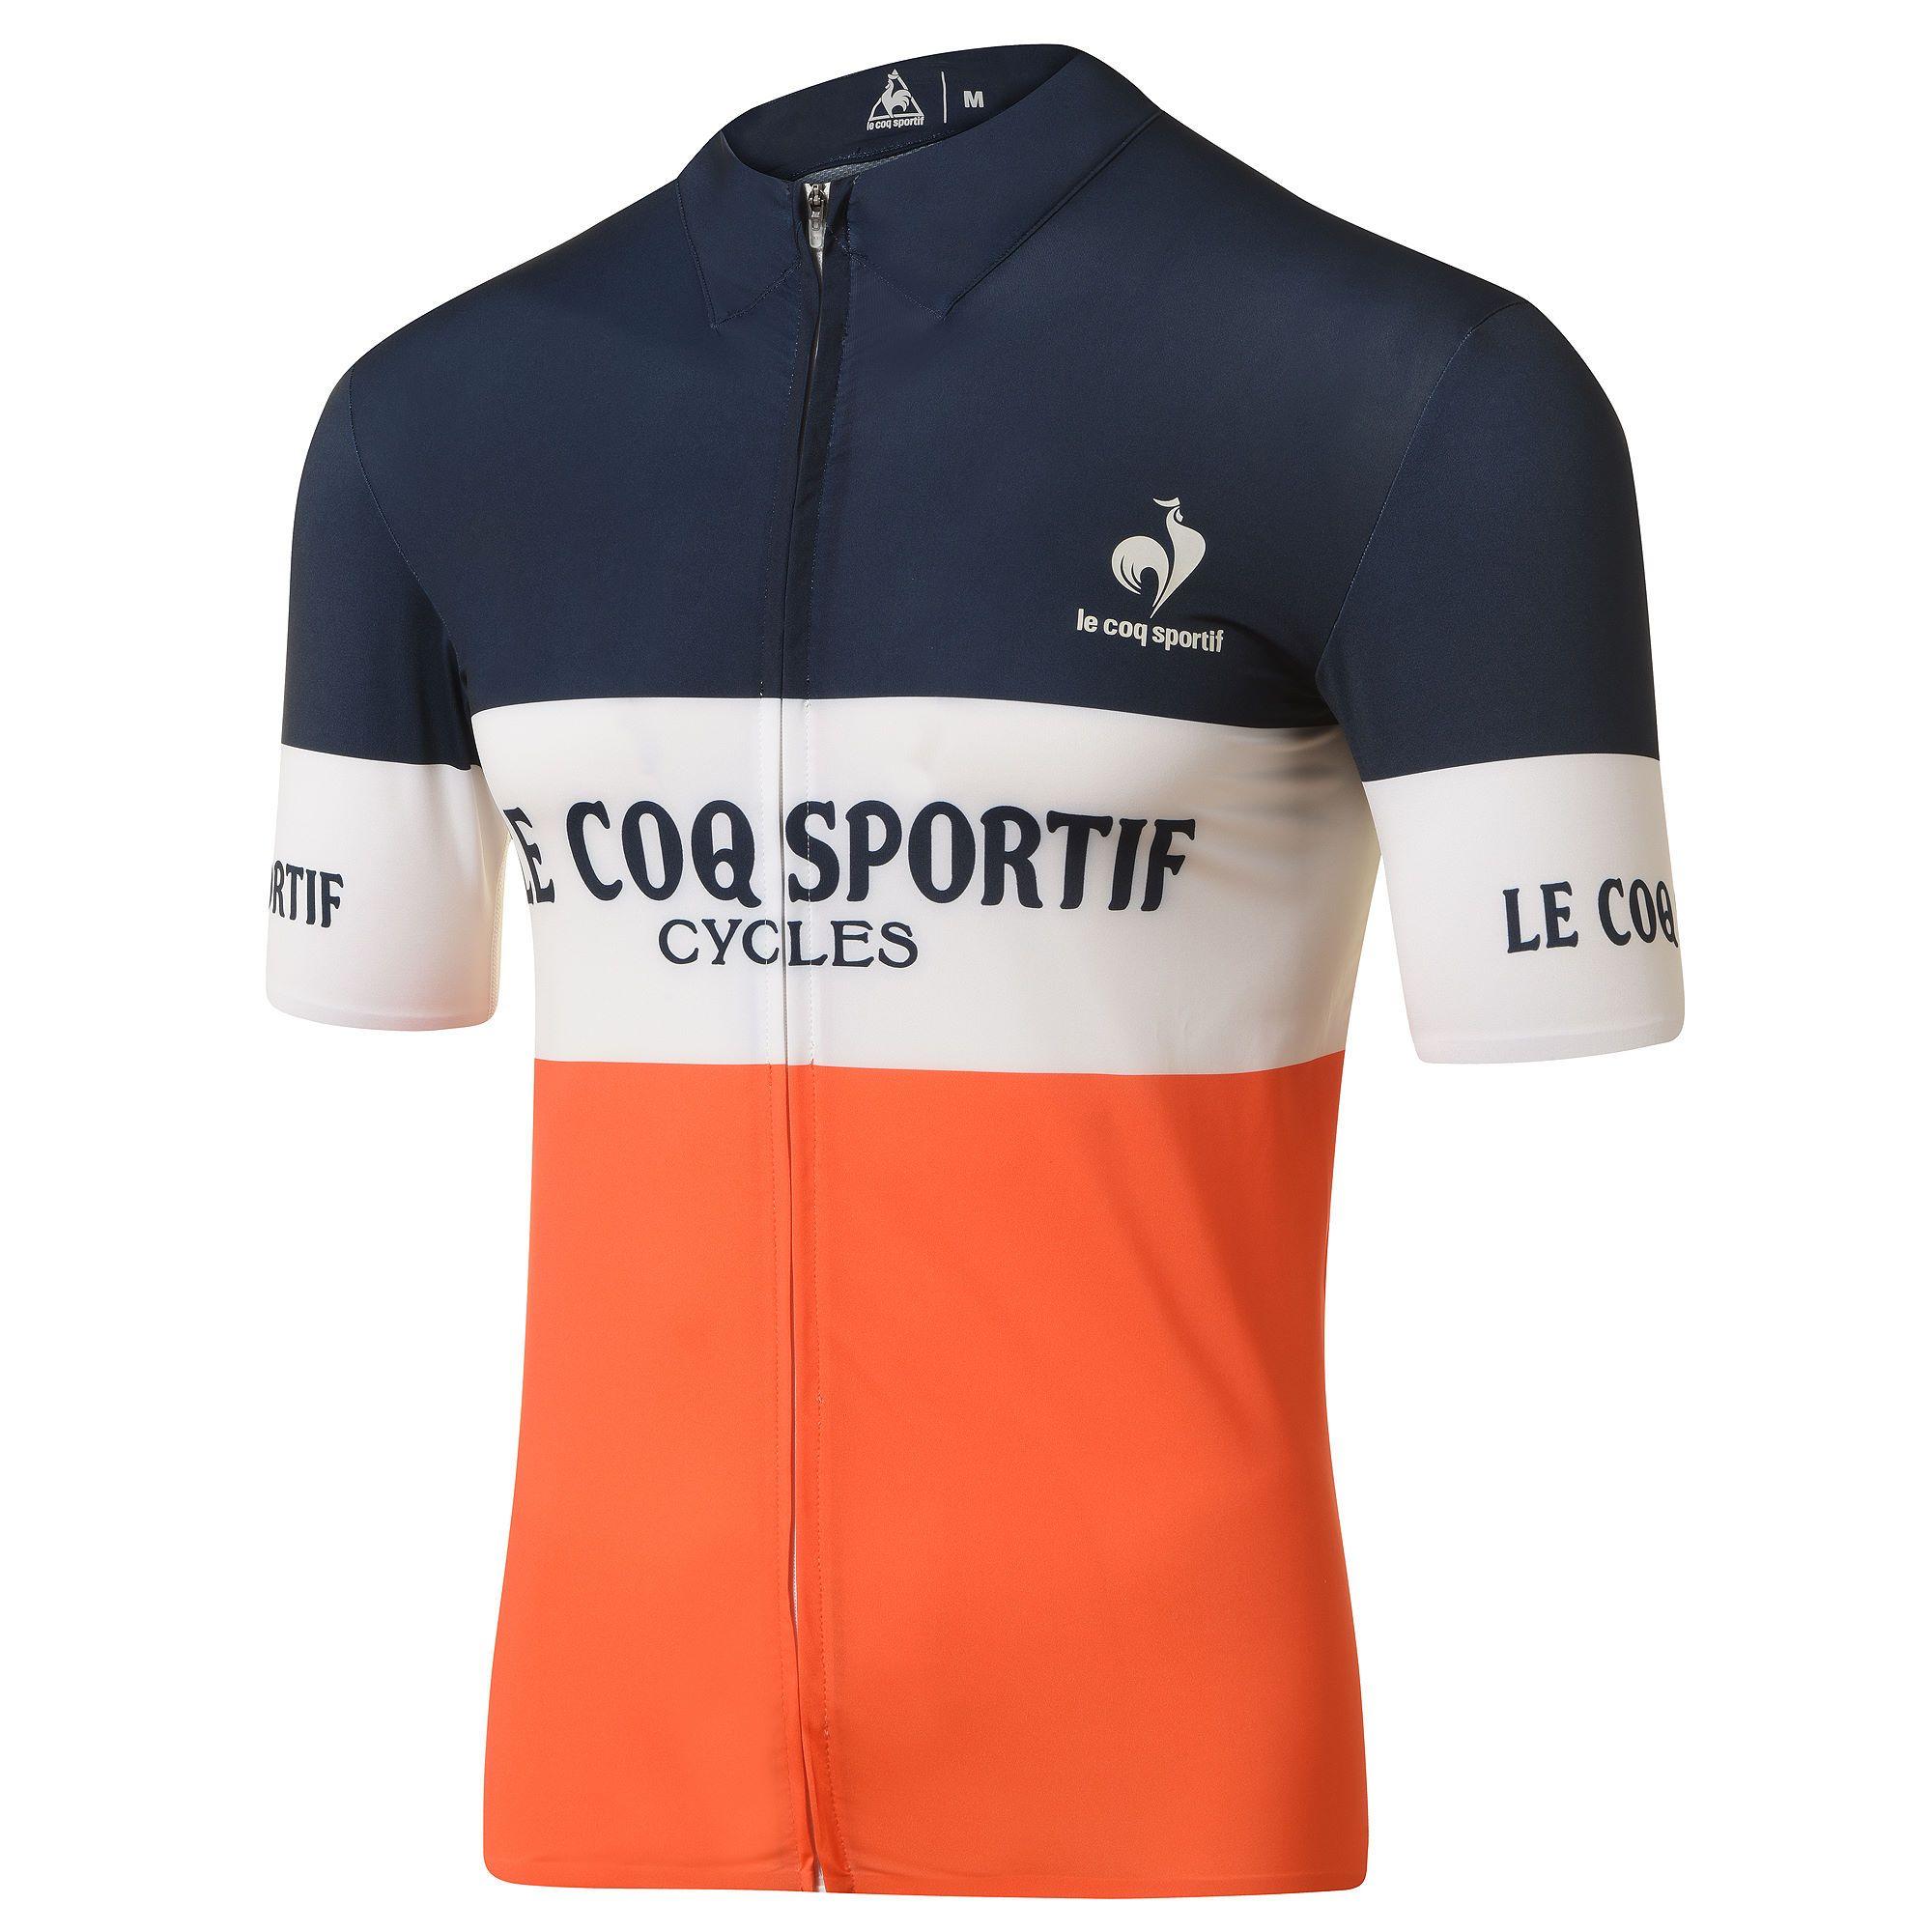 Le Coq Sportif Ares Short Sleeve Jersey | Jerseys